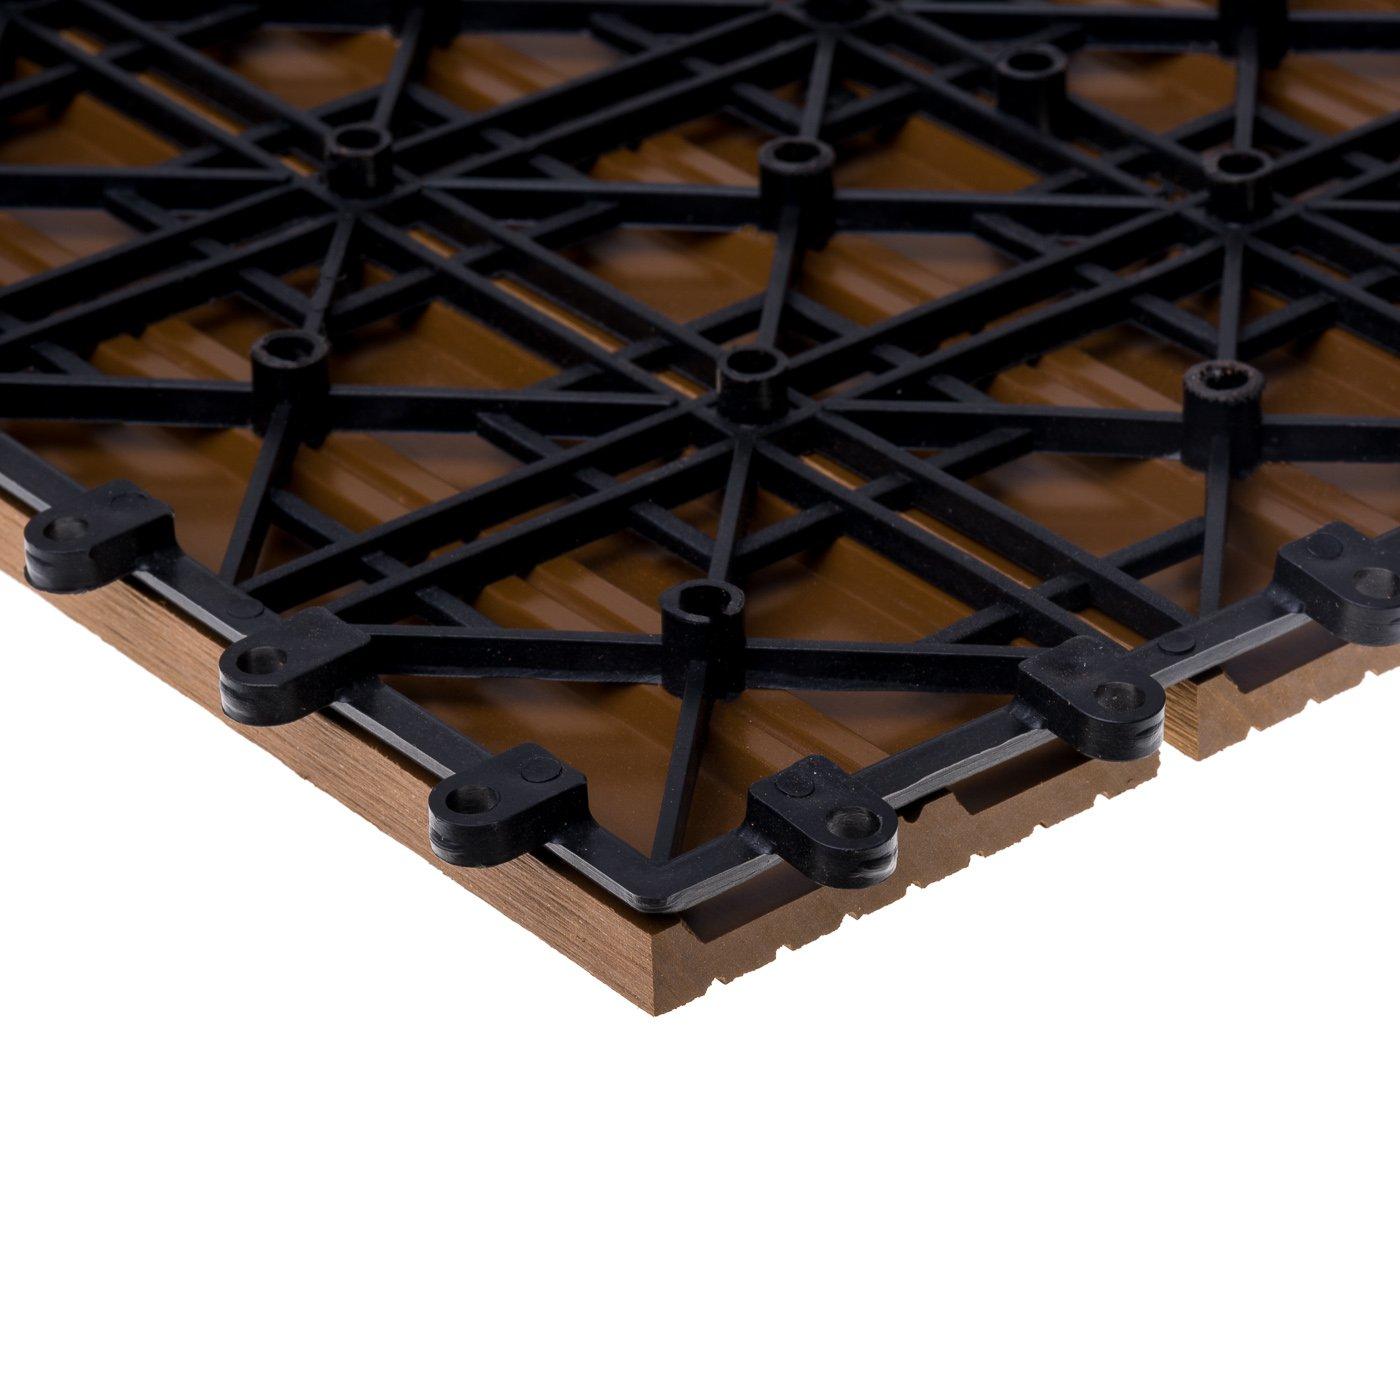 WPC Terrassenfliesen 11 St/ück 30x30 cm Mosaik, braun 1 qm Bodenfliesen Terrassenbelag Klickfliese